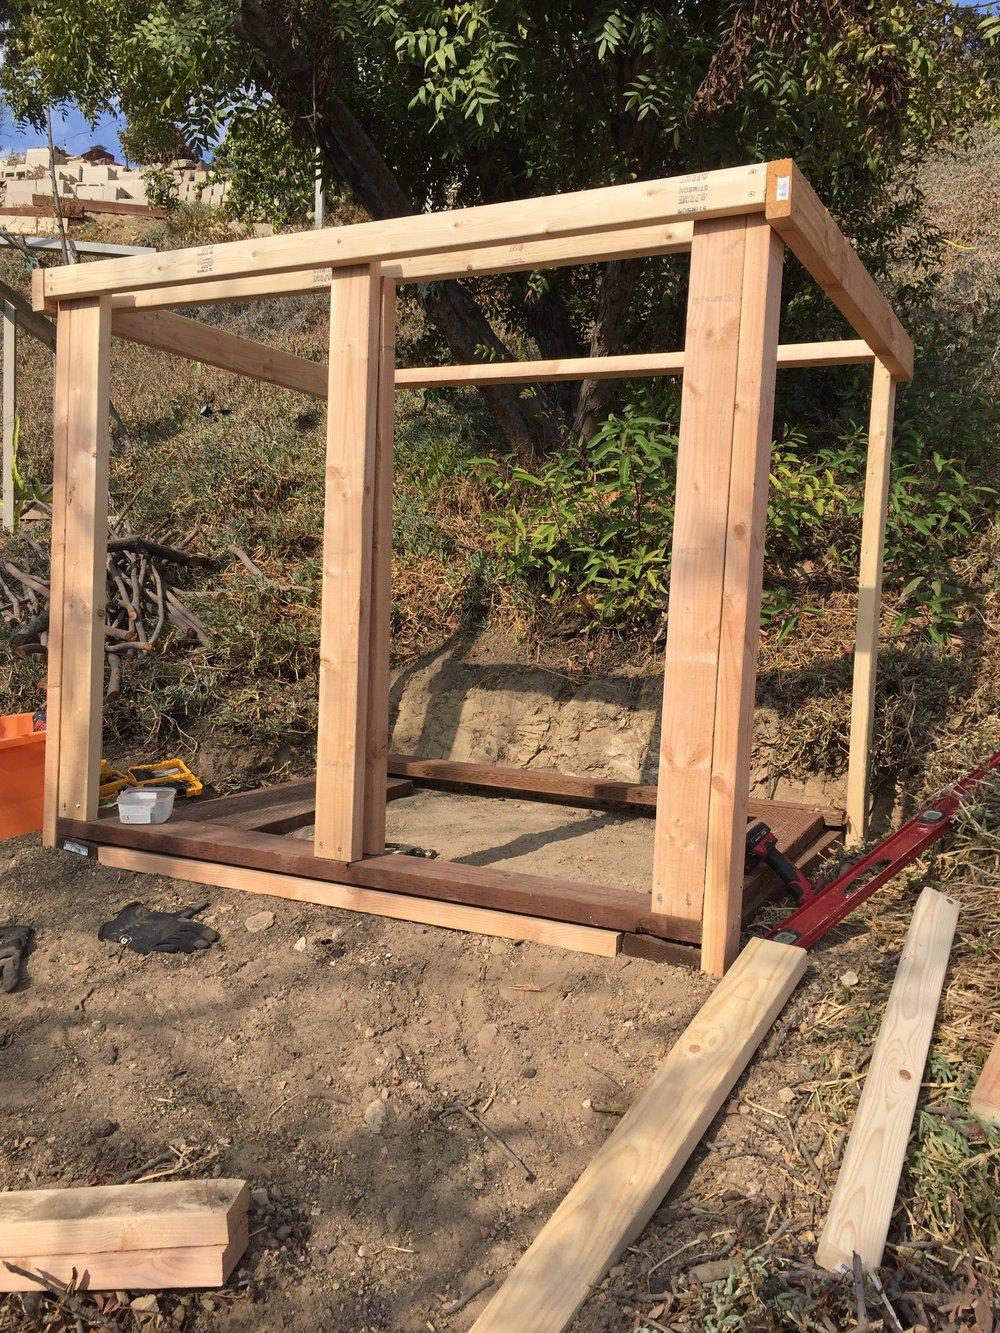 Dual Compartment Compost Bin - 5' x 4' x 4'